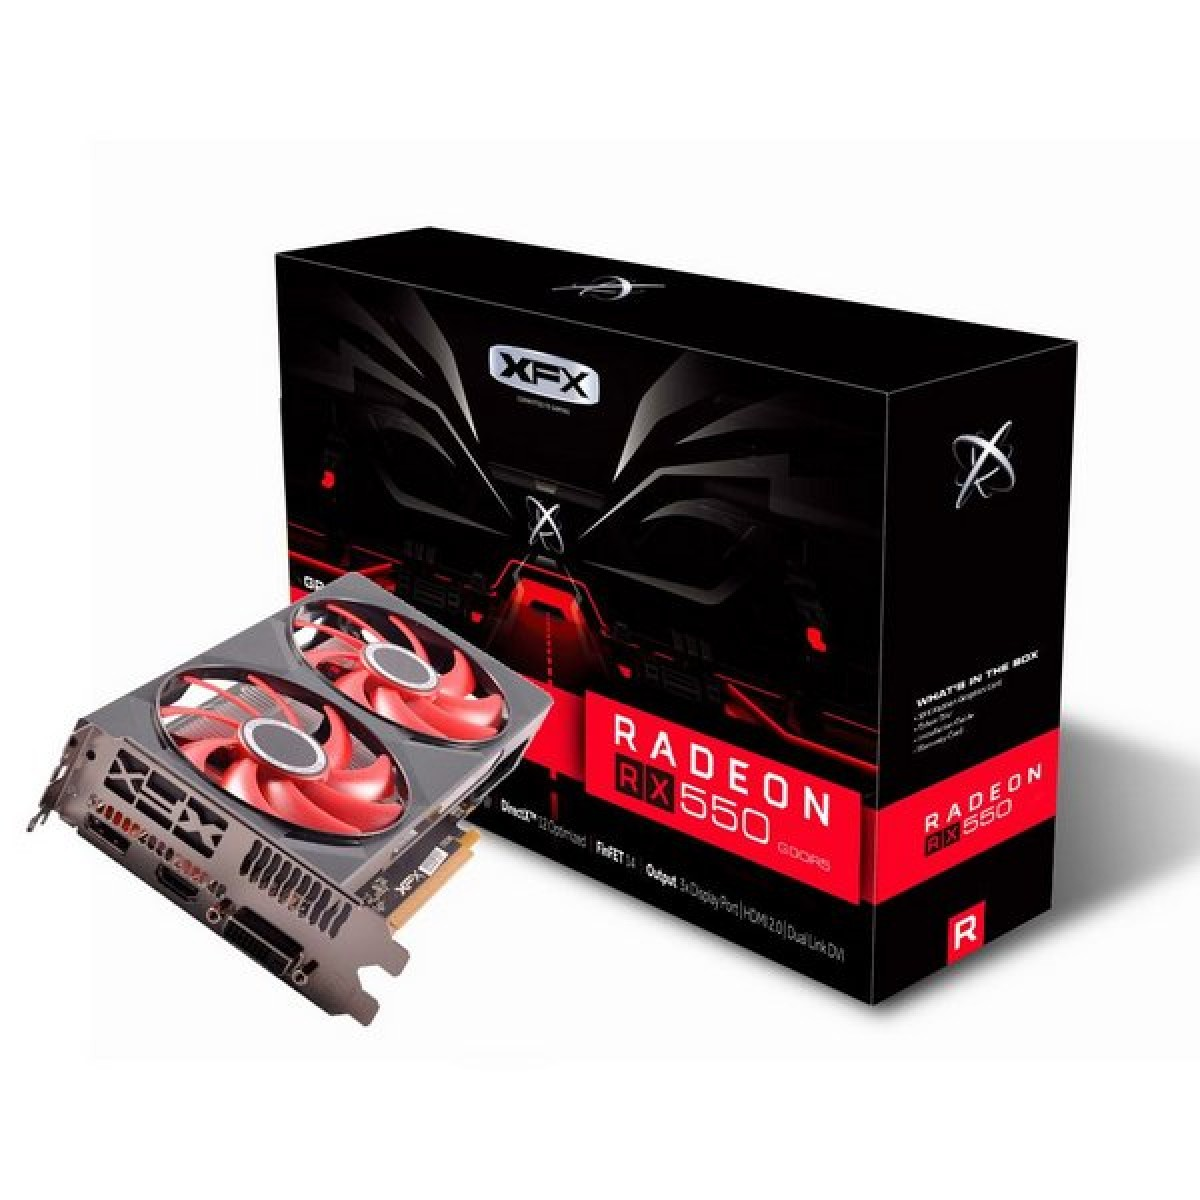 Placa de Video XFX AMD Radeon RX 550 4GB GDDR5 128bit 550P4PFG5